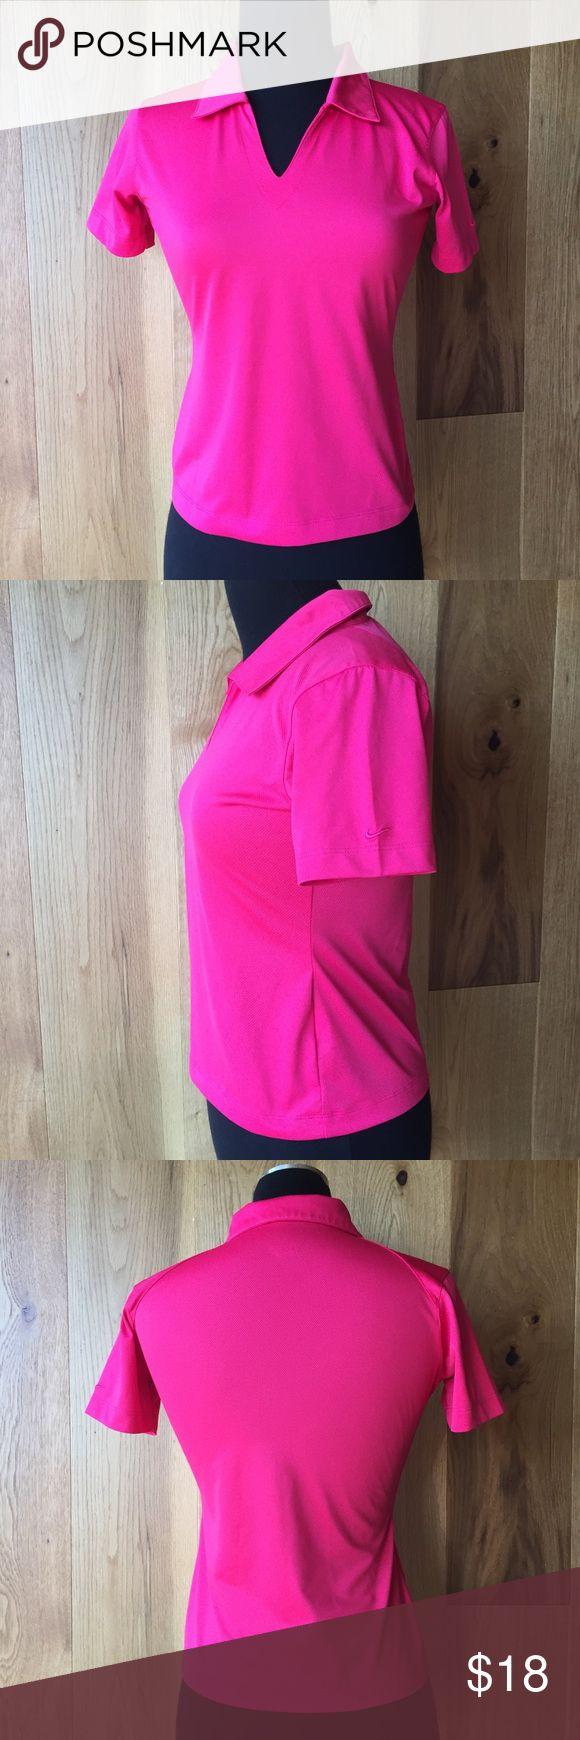 NIKE GOLF POLO SHIRT XS Pink NIKE GOLF FIT DRY polo shirt.  Size XS (1-2).  Gently used, pet/smoke free home Nike Tops Tees - Short Sleeve